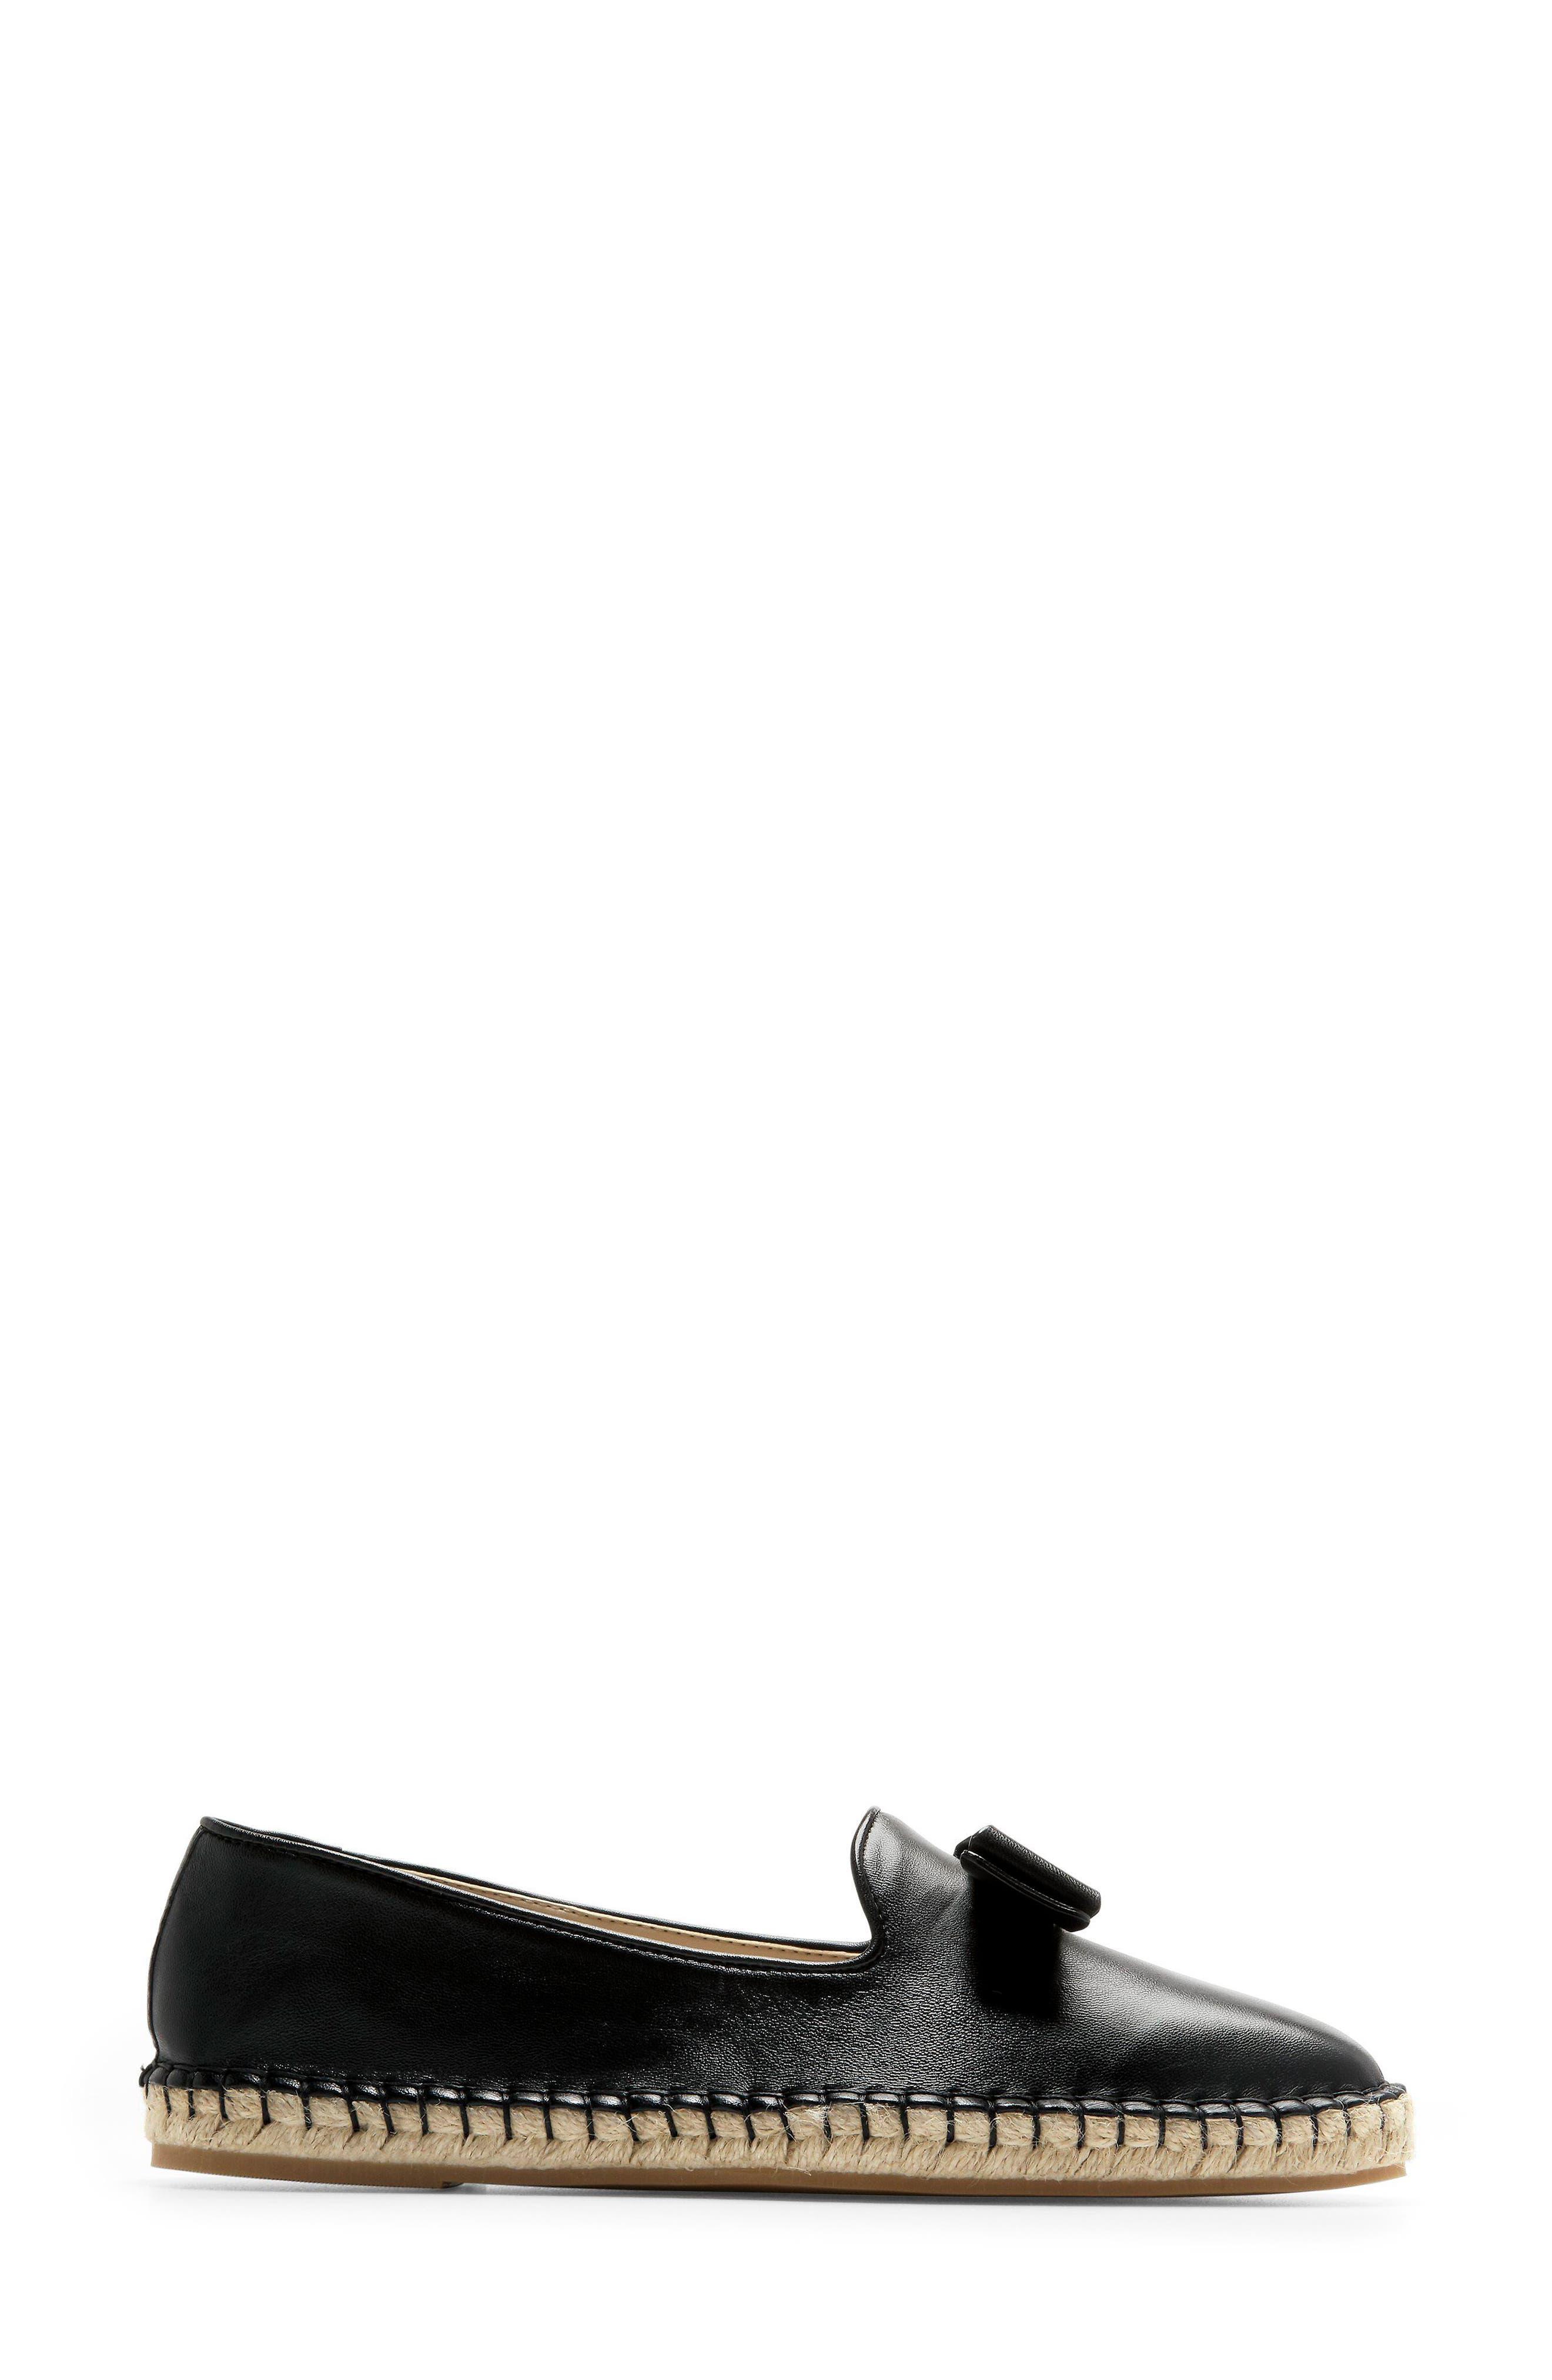 Tali Bow Espadrille Flat,                             Alternate thumbnail 3, color,                             Black Leather